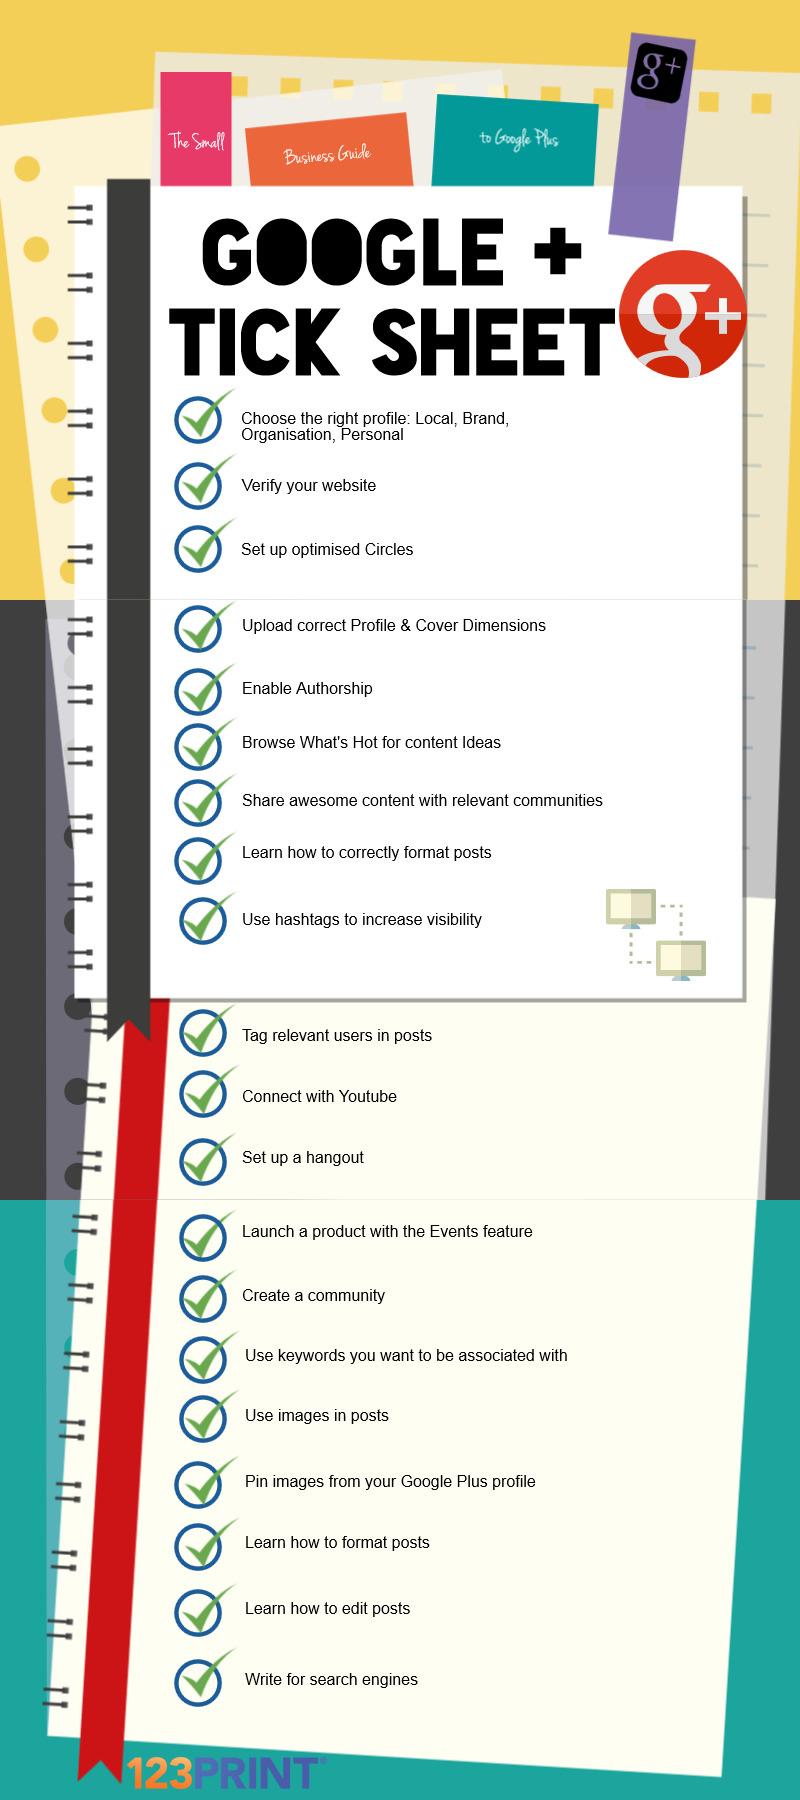 Google Plus Tick Sheet Infographic